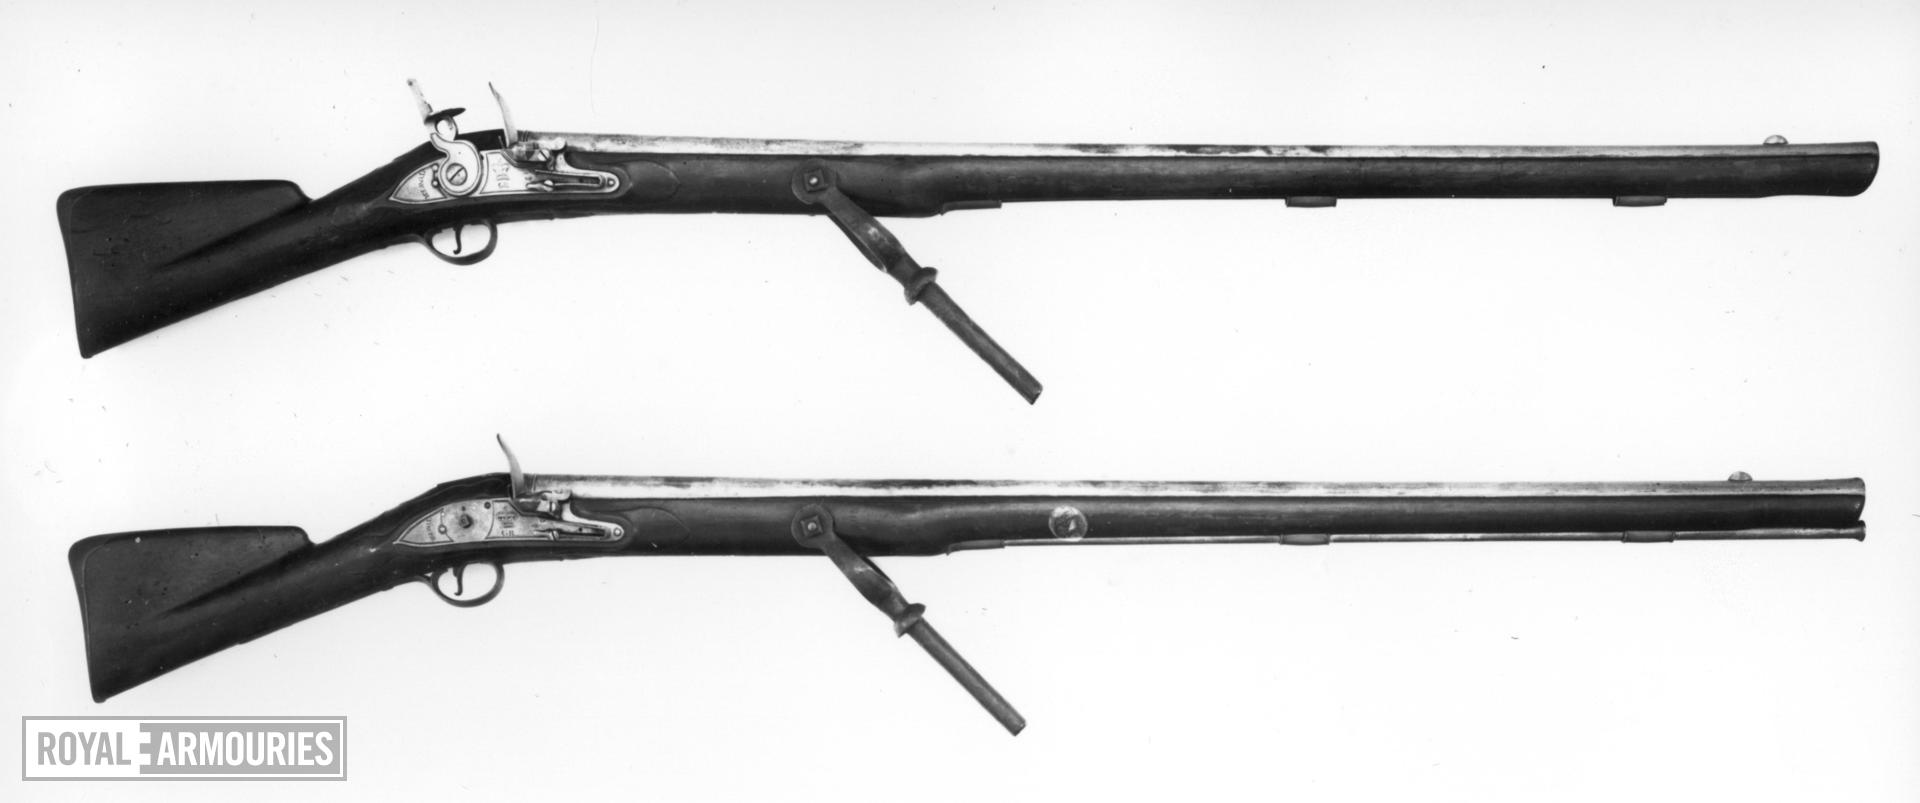 Flintlock military wall gun